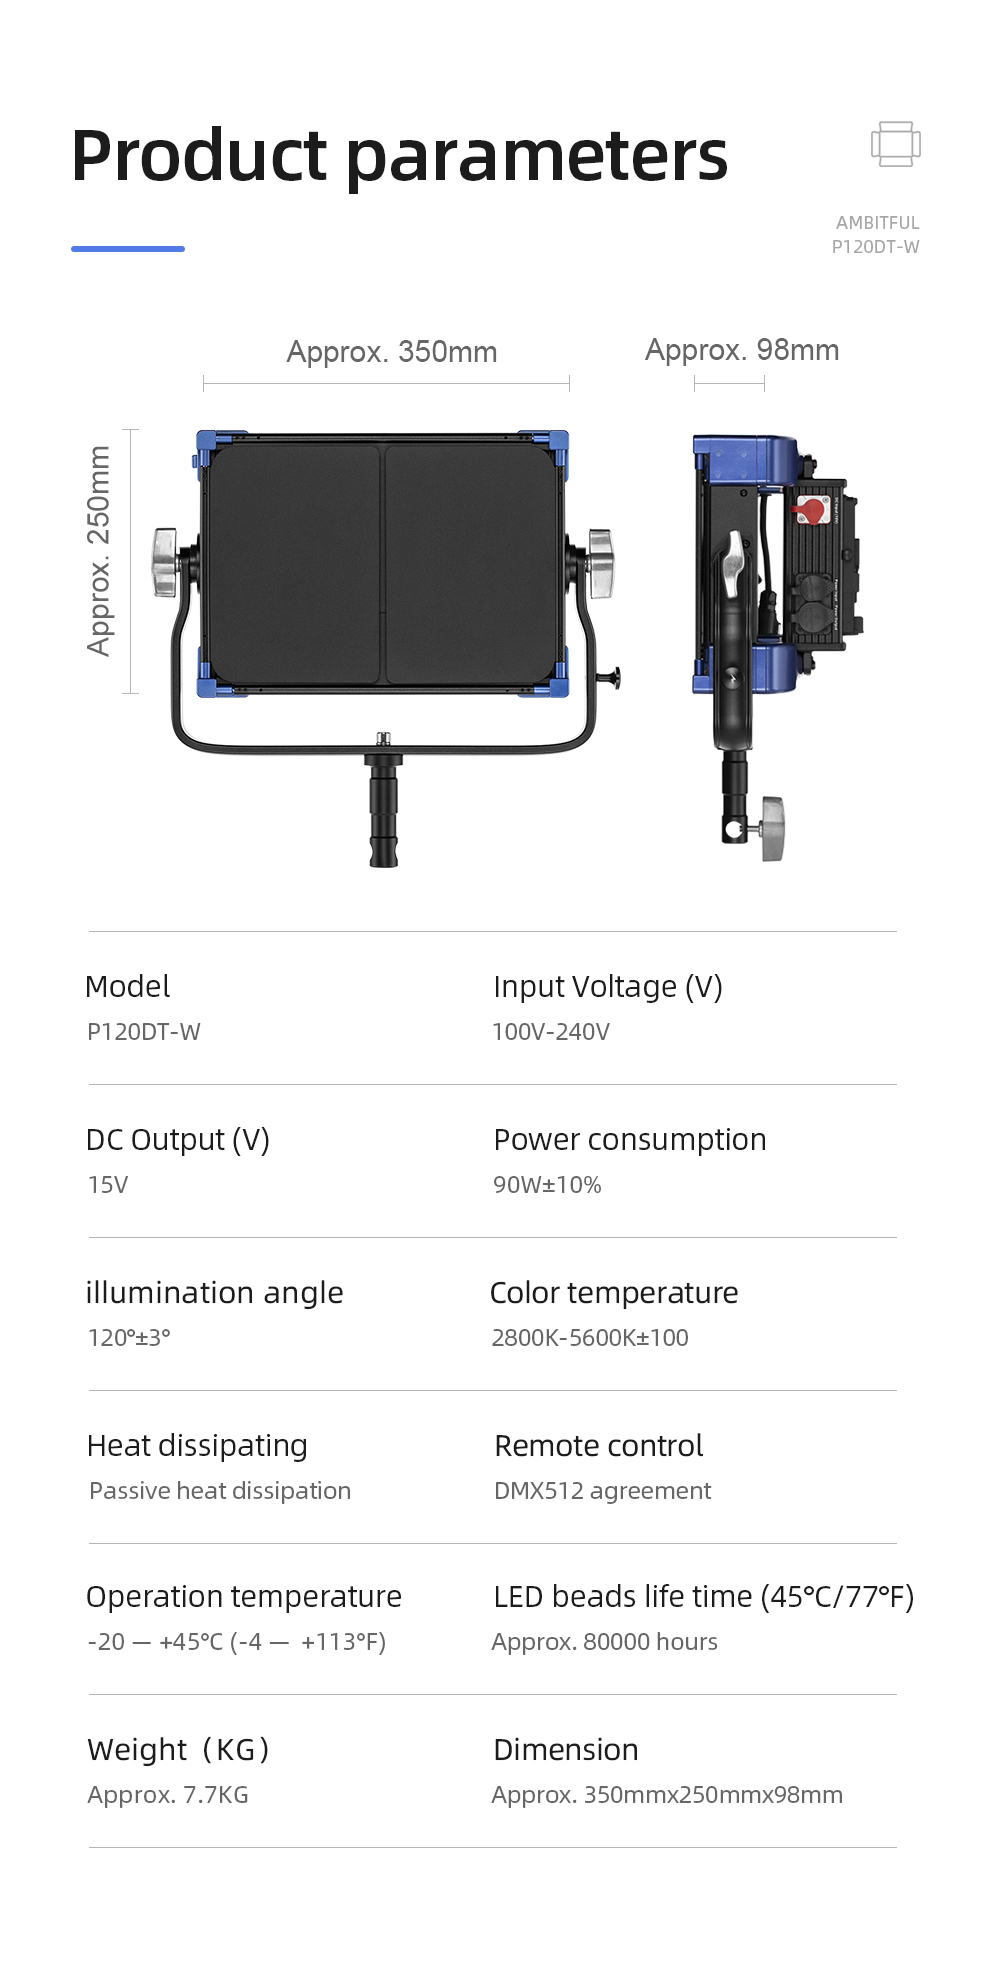 AMBITFUL P120DT-W LED Video Light 90W Bi-Color 2800K-5600K CRI 97 TLCI 99 for News Interview Video Shoting Professional Studio